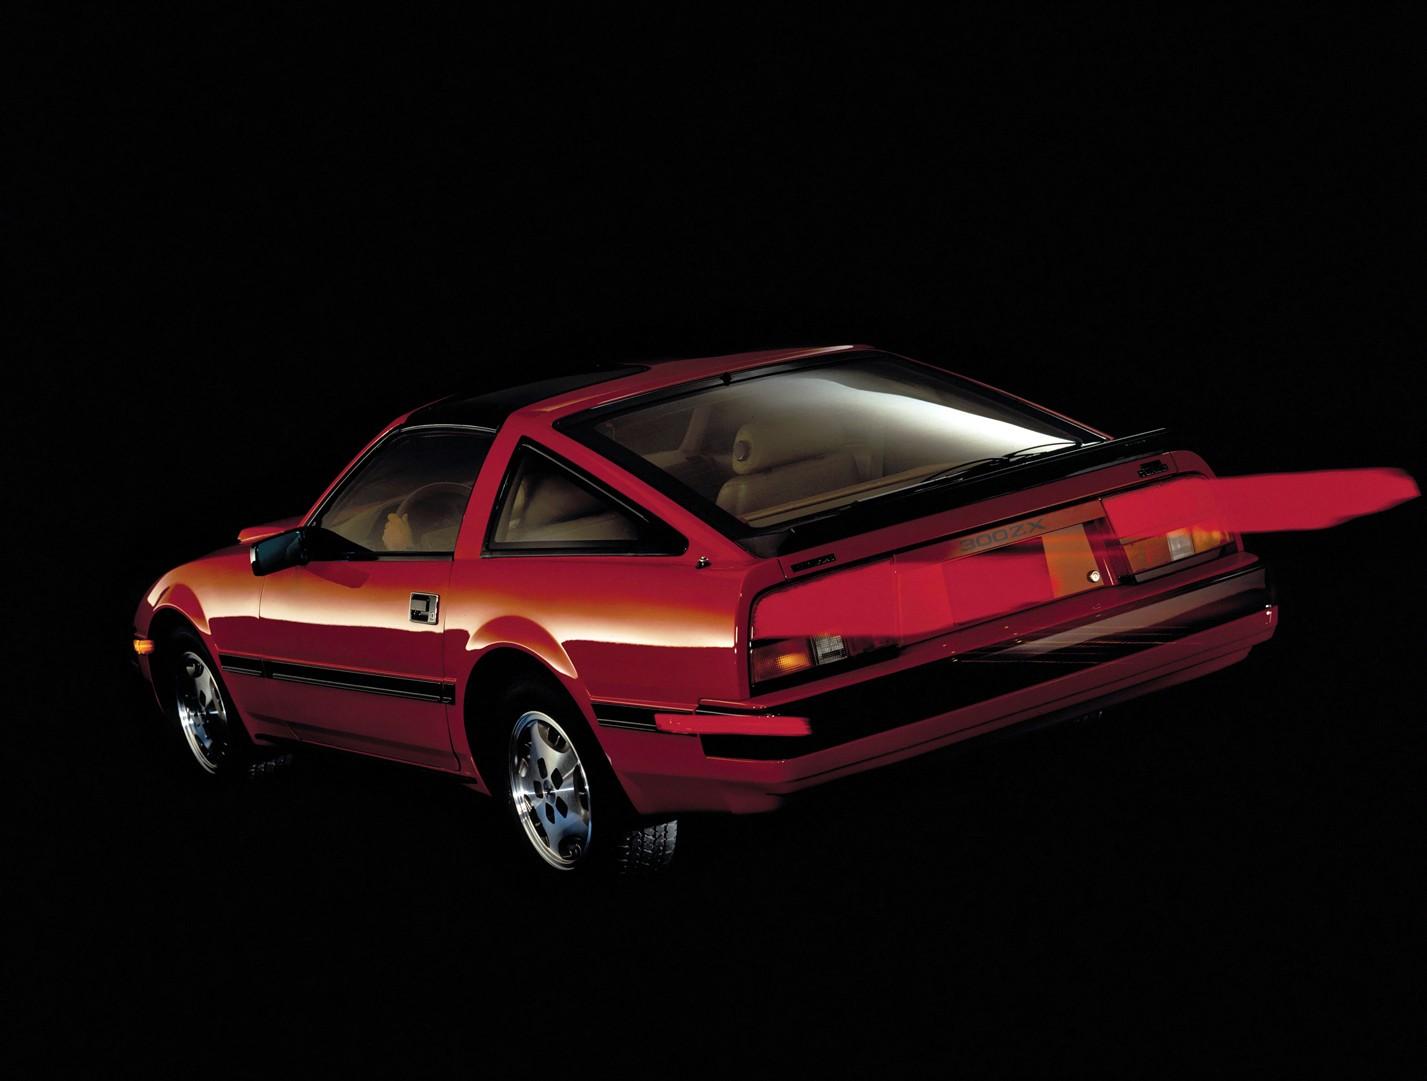 nissan 300 zx 1984 1985 1986 1987 1988 1989 autoevolution. Black Bedroom Furniture Sets. Home Design Ideas